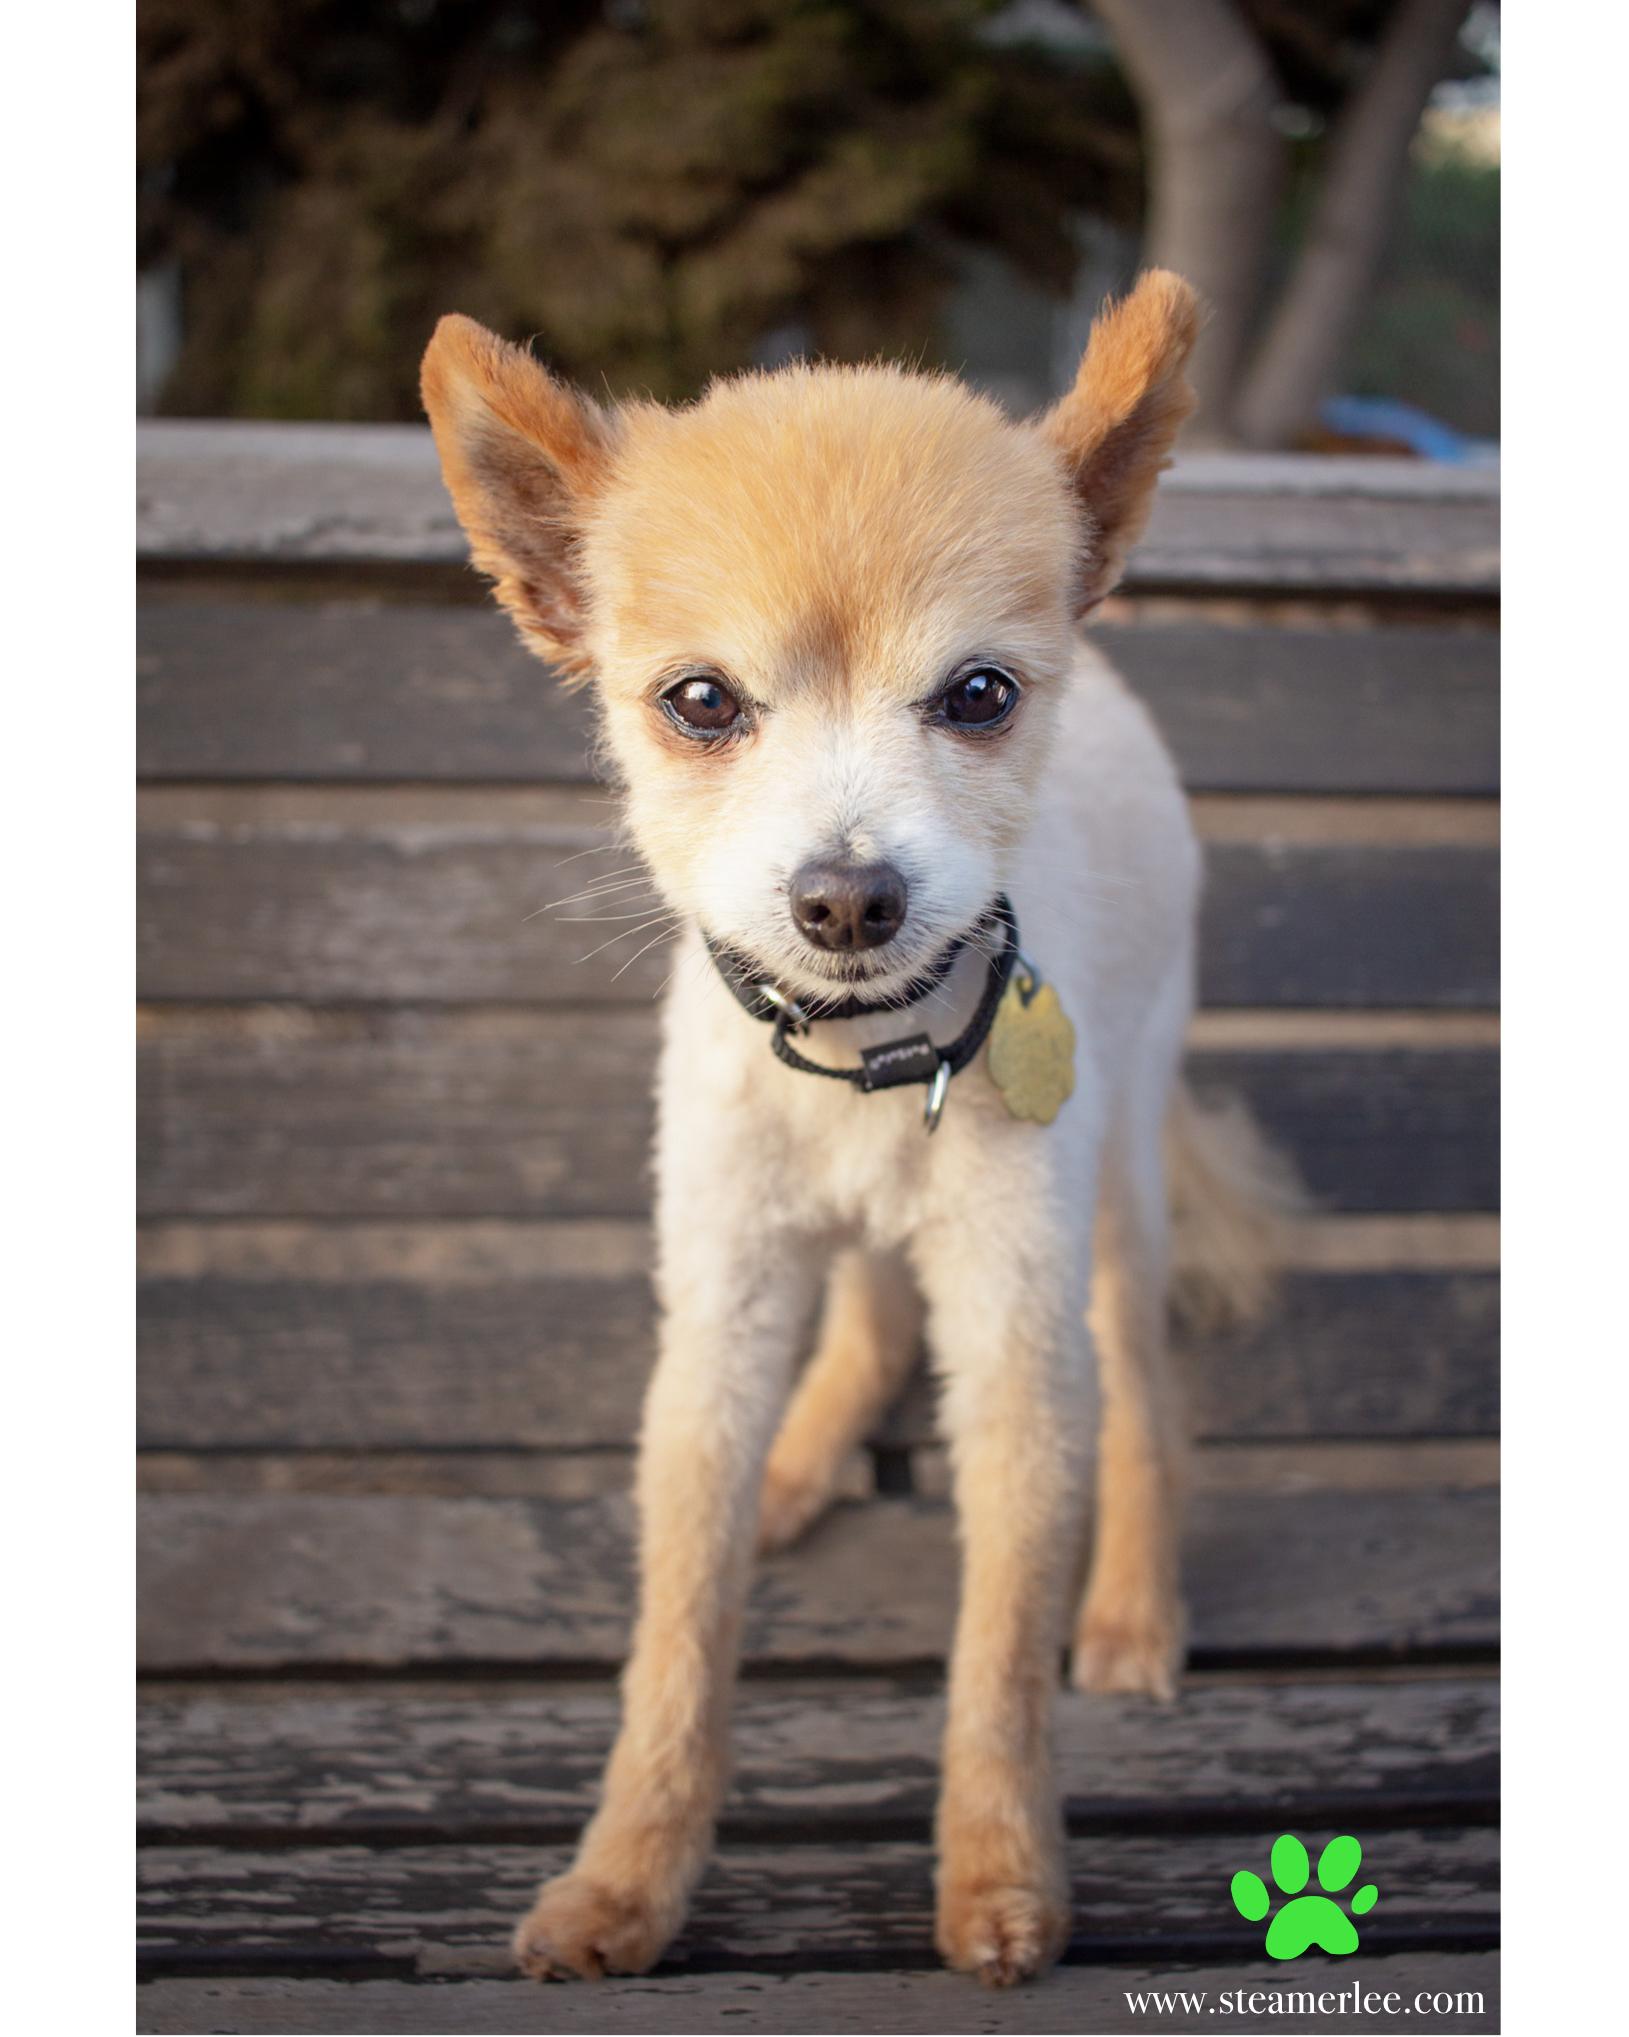 327-Orange-County-Dog-Photography-Steamer-Lee-Southern-California-SBACC.JPG